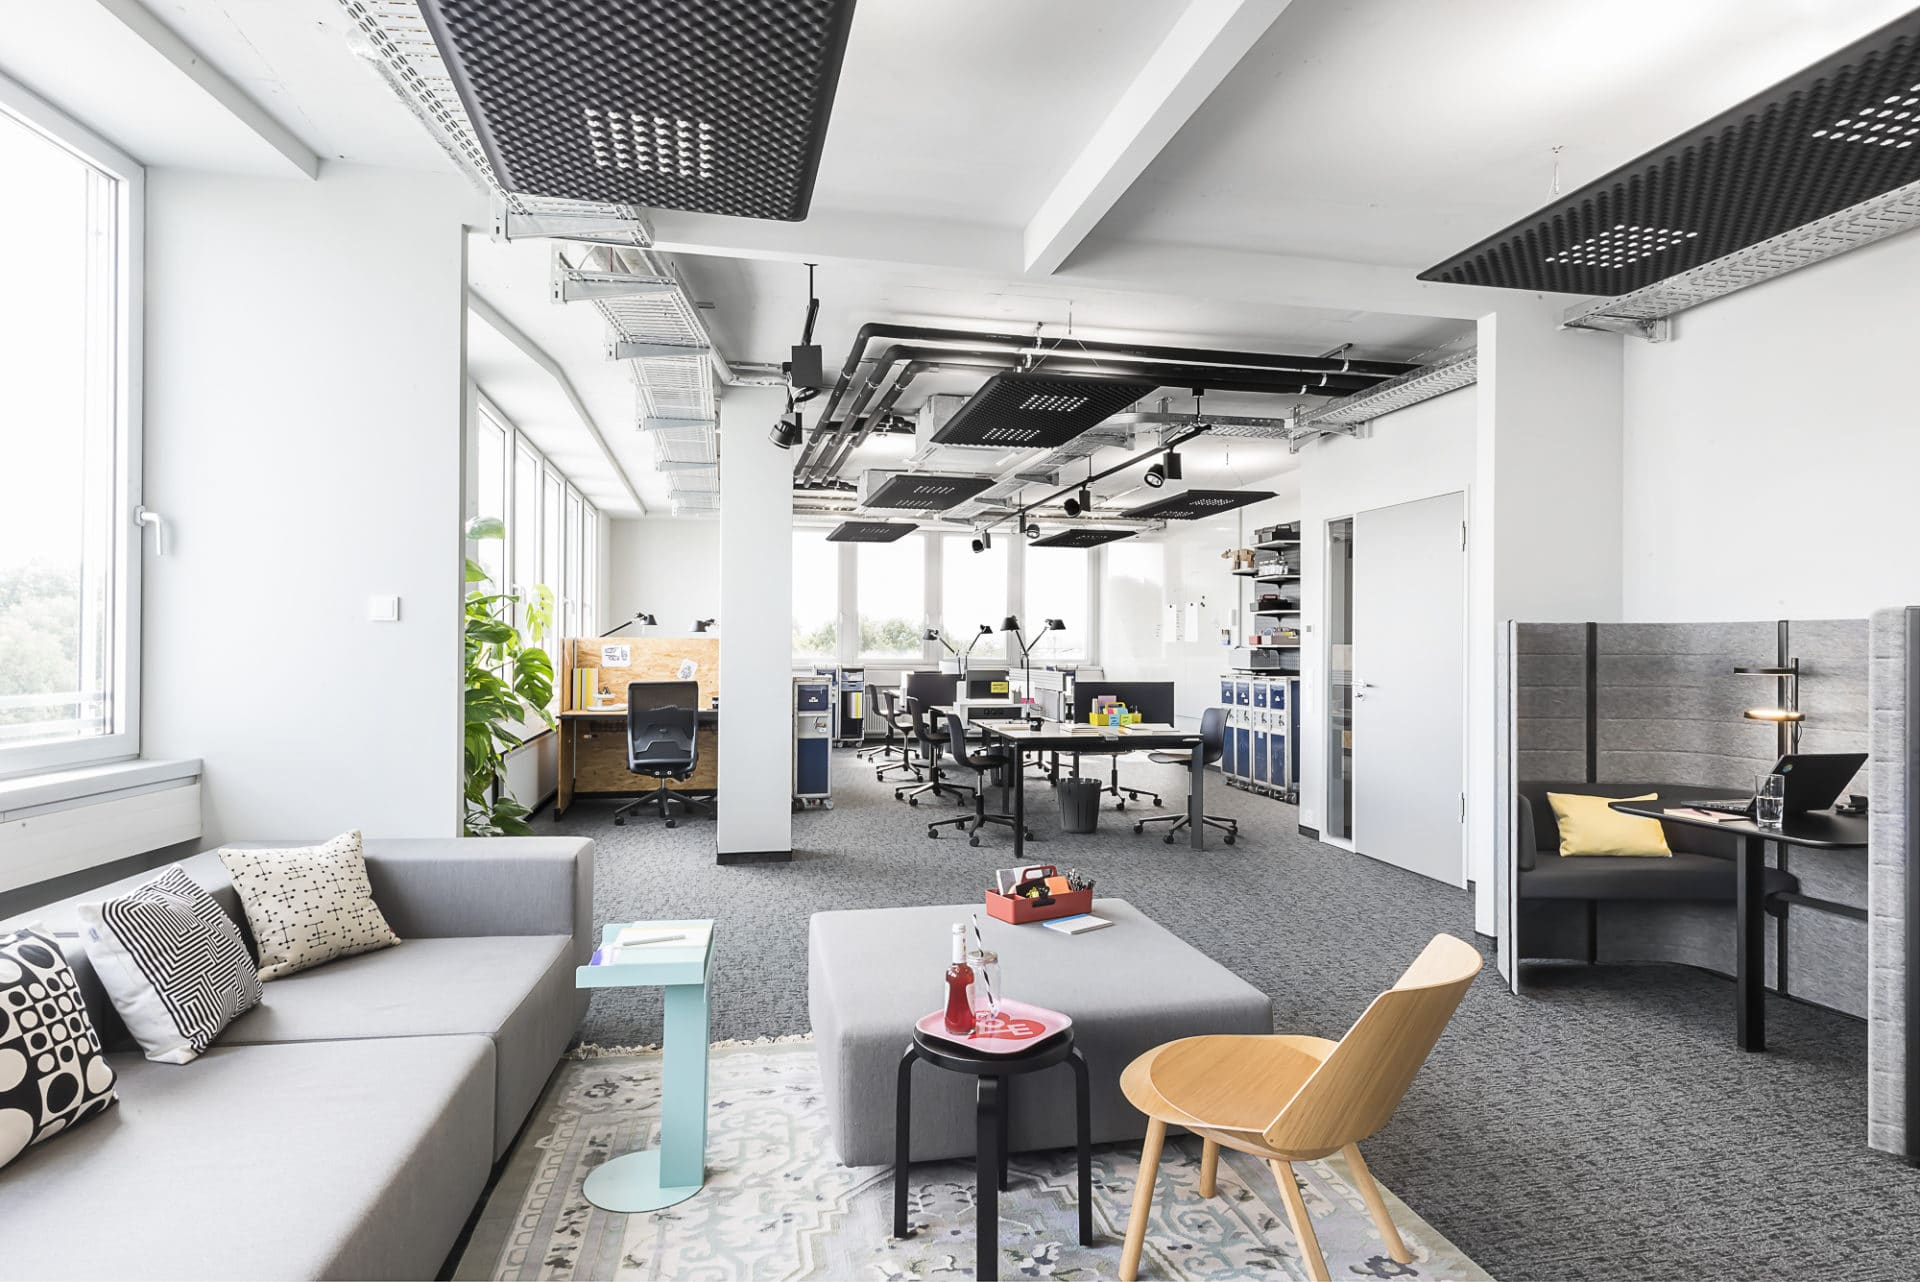 Work Loft - Corporate Coworking 1 ©Design Offices